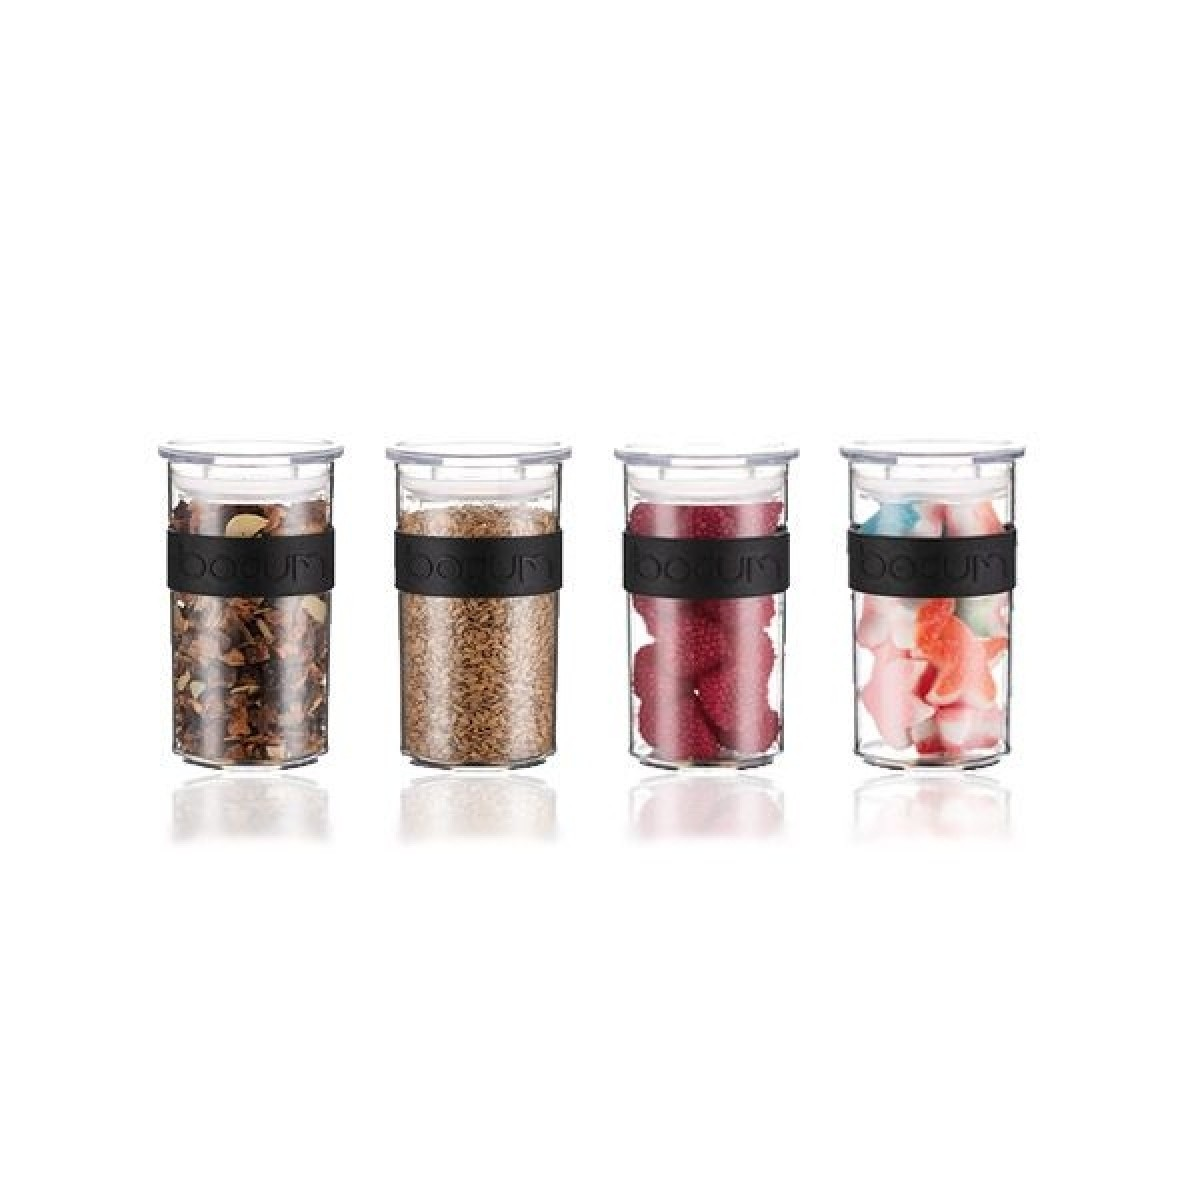 BODUM Opbevaringsglas presso 0,25 ltr brudsikkert 4 stk